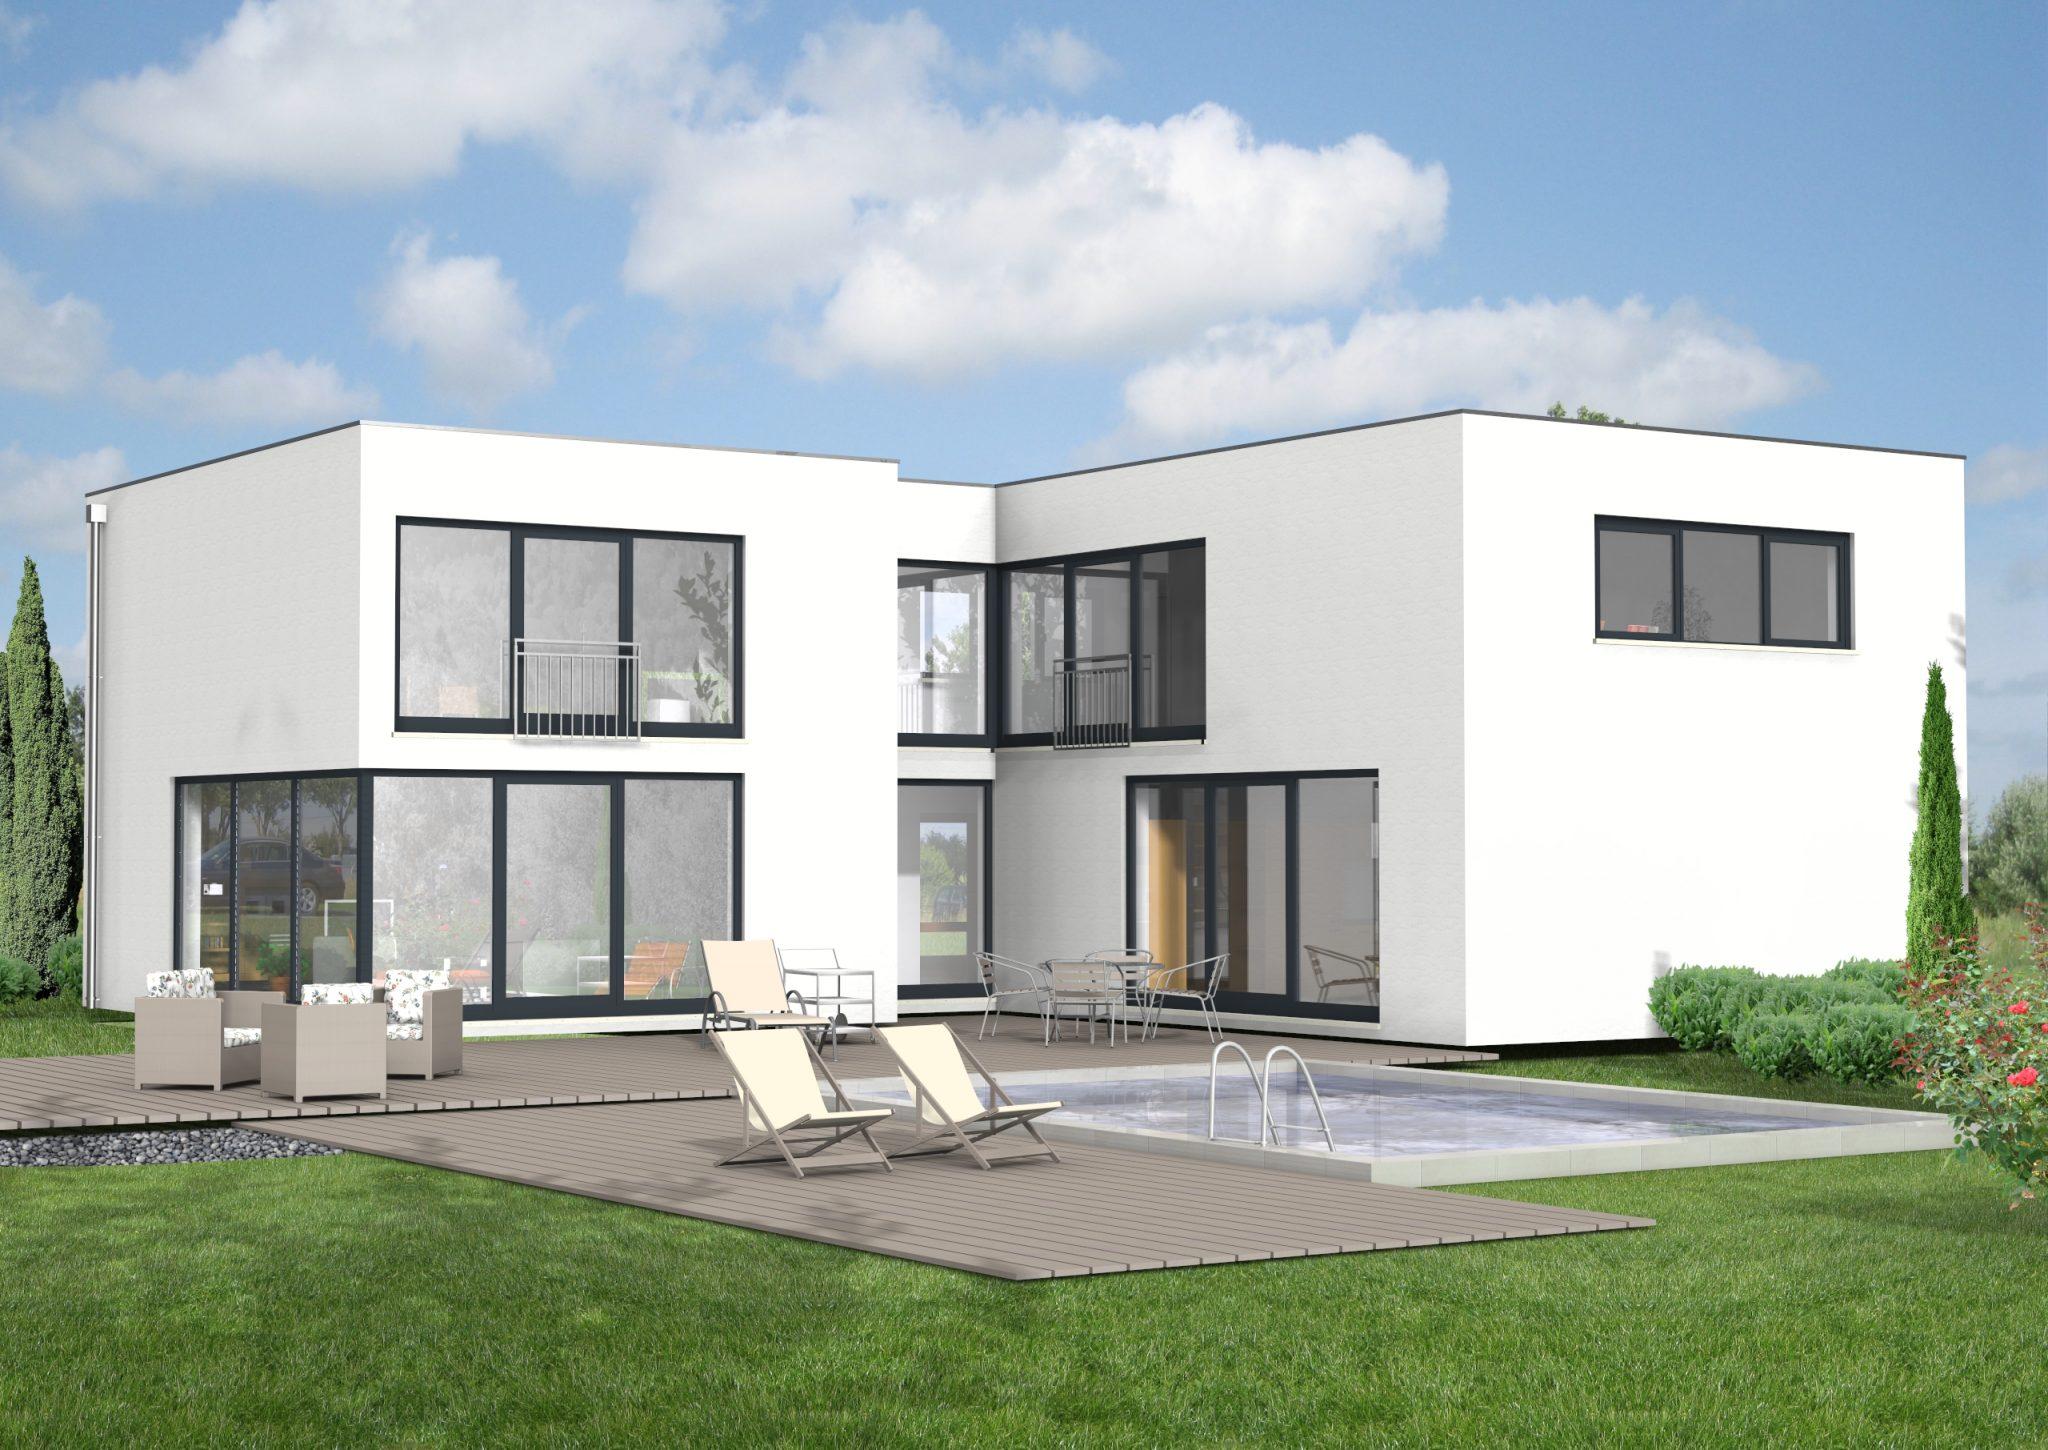 kologischer hausbau immobilien finanzierung g nther fr auf. Black Bedroom Furniture Sets. Home Design Ideas